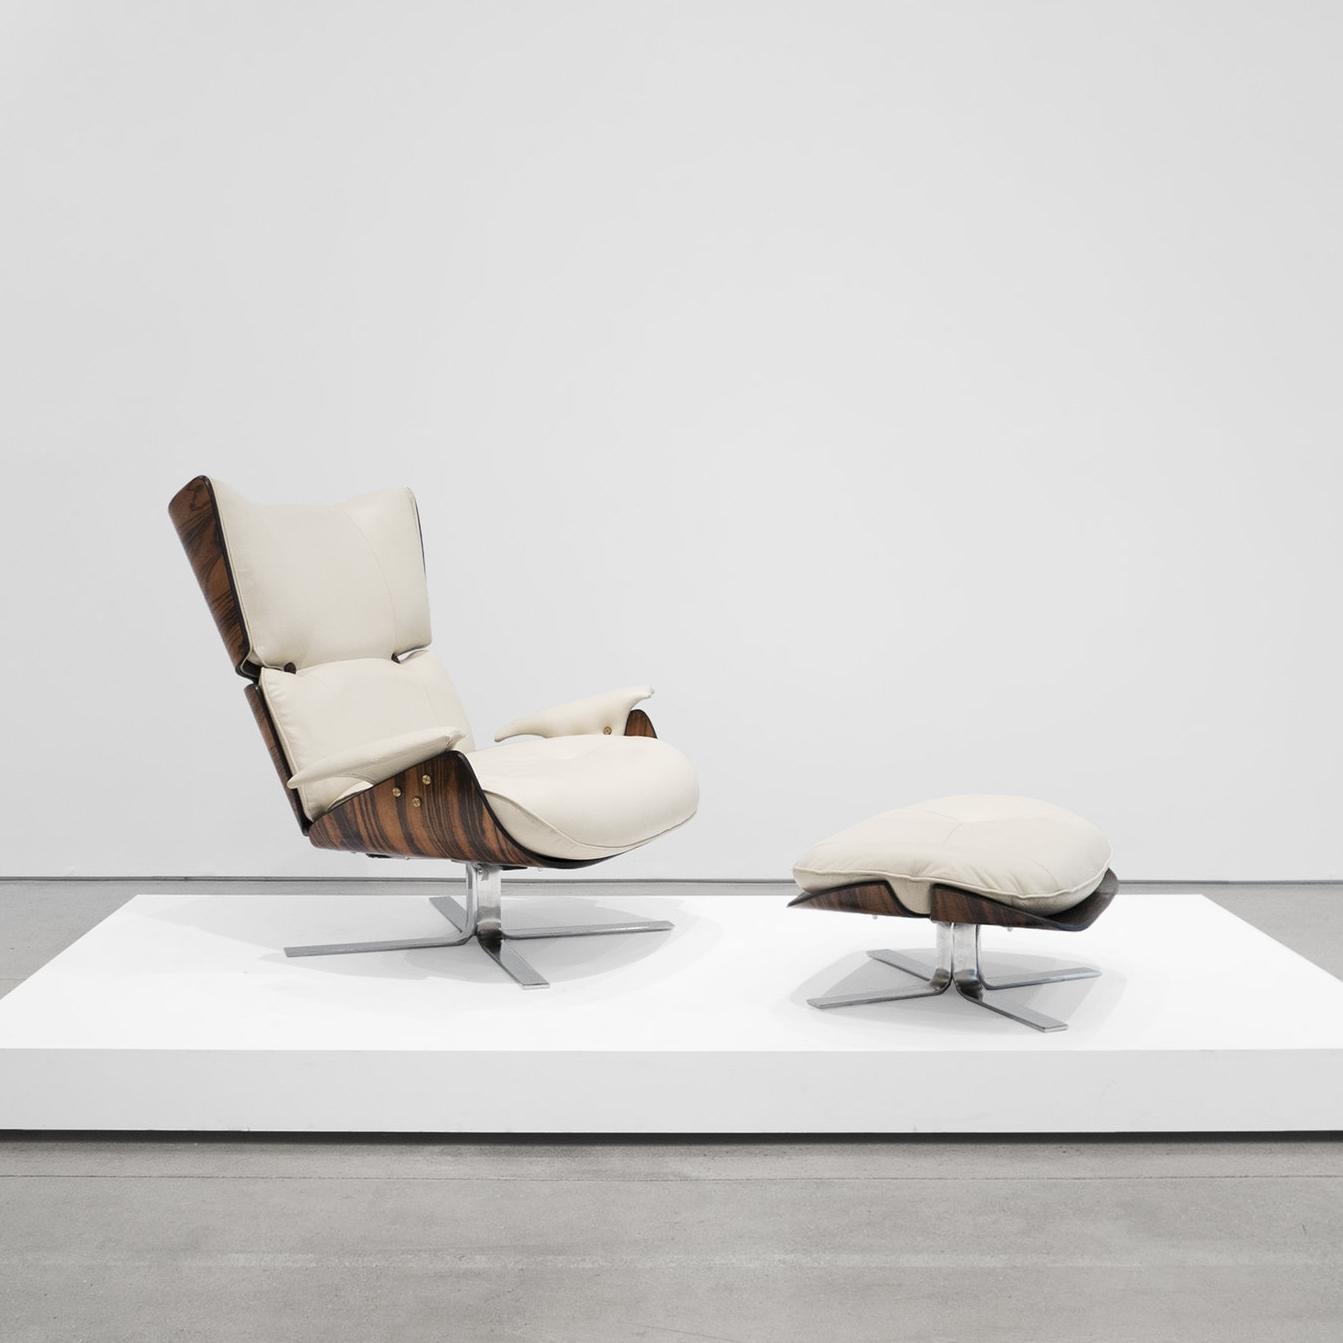 JORGE zalszupin  paulistana lounge chair and ottoman  1956 - 1965 ...